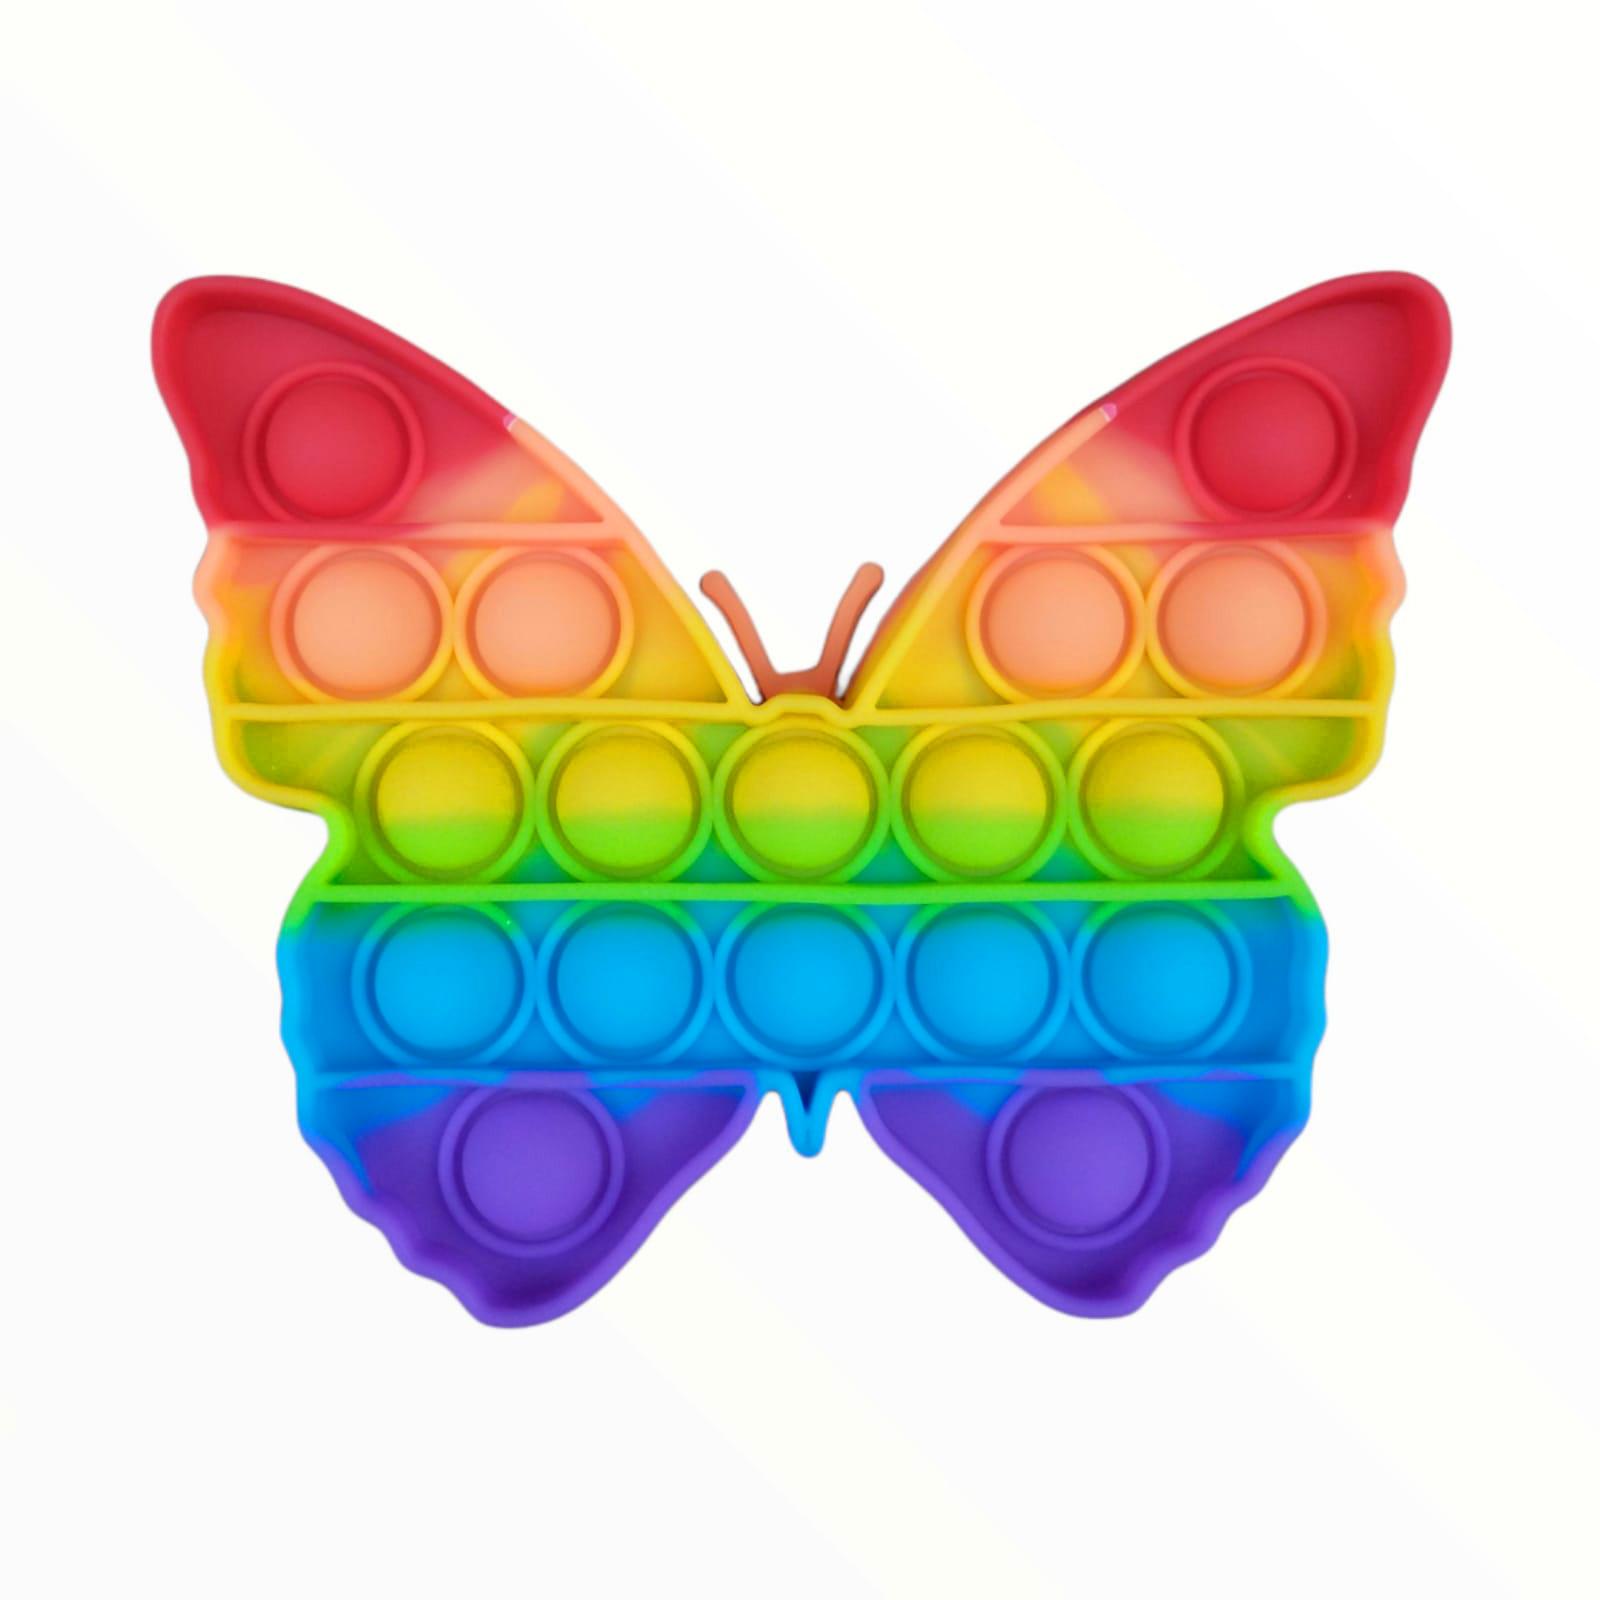 Brinquedo Anti-stress Pop It Fidget Toys - Borboleta